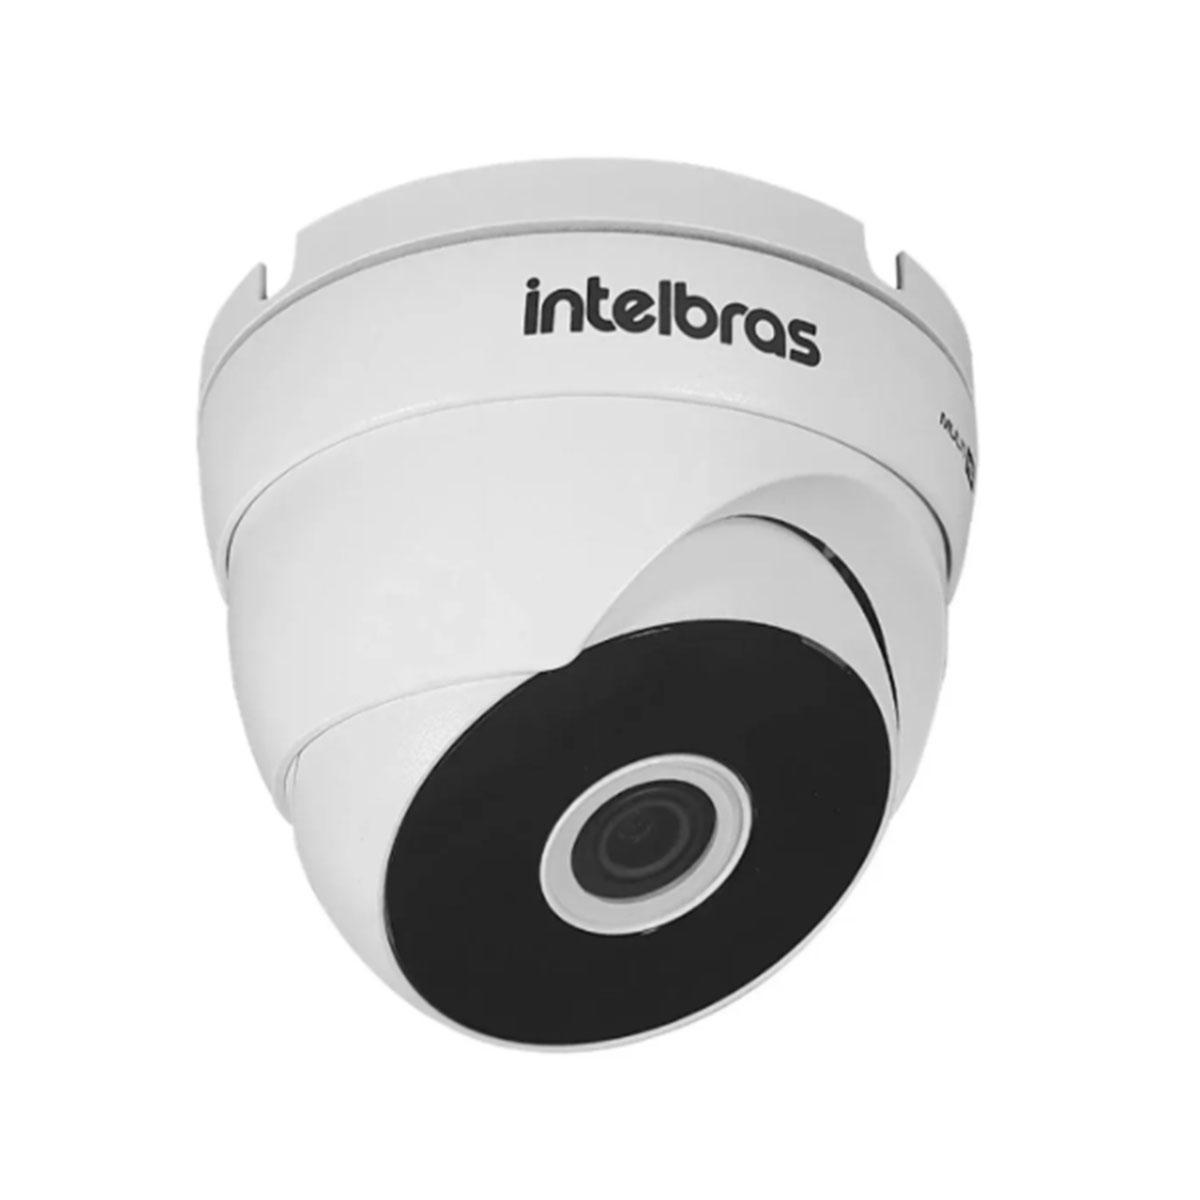 Kit Câmera Intelbras 3120 D G6 720p 3.6mm + Fonte Ef 1201